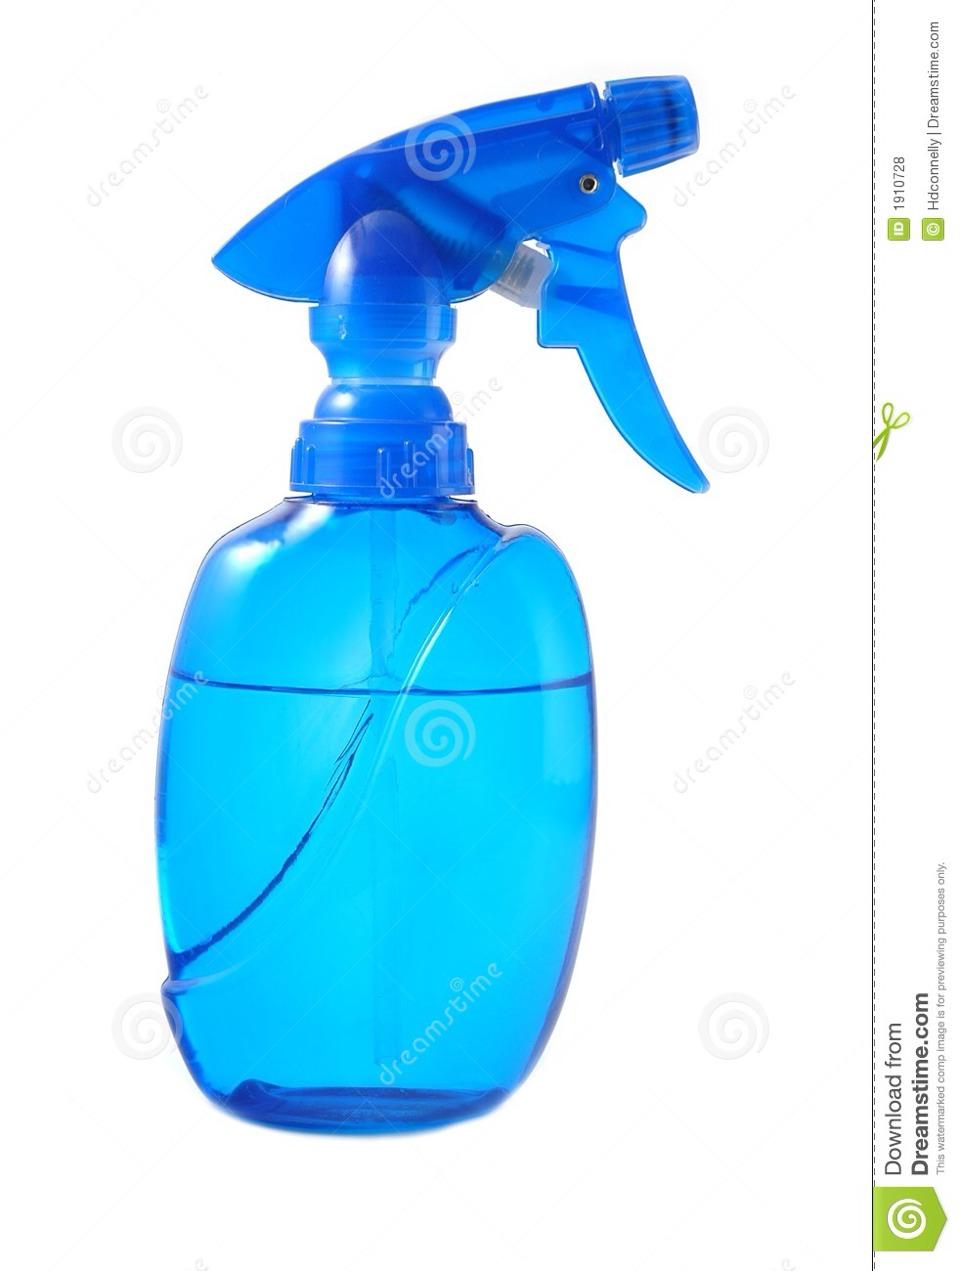 Liquid  Water is the best , get your hair wet too add moisture .